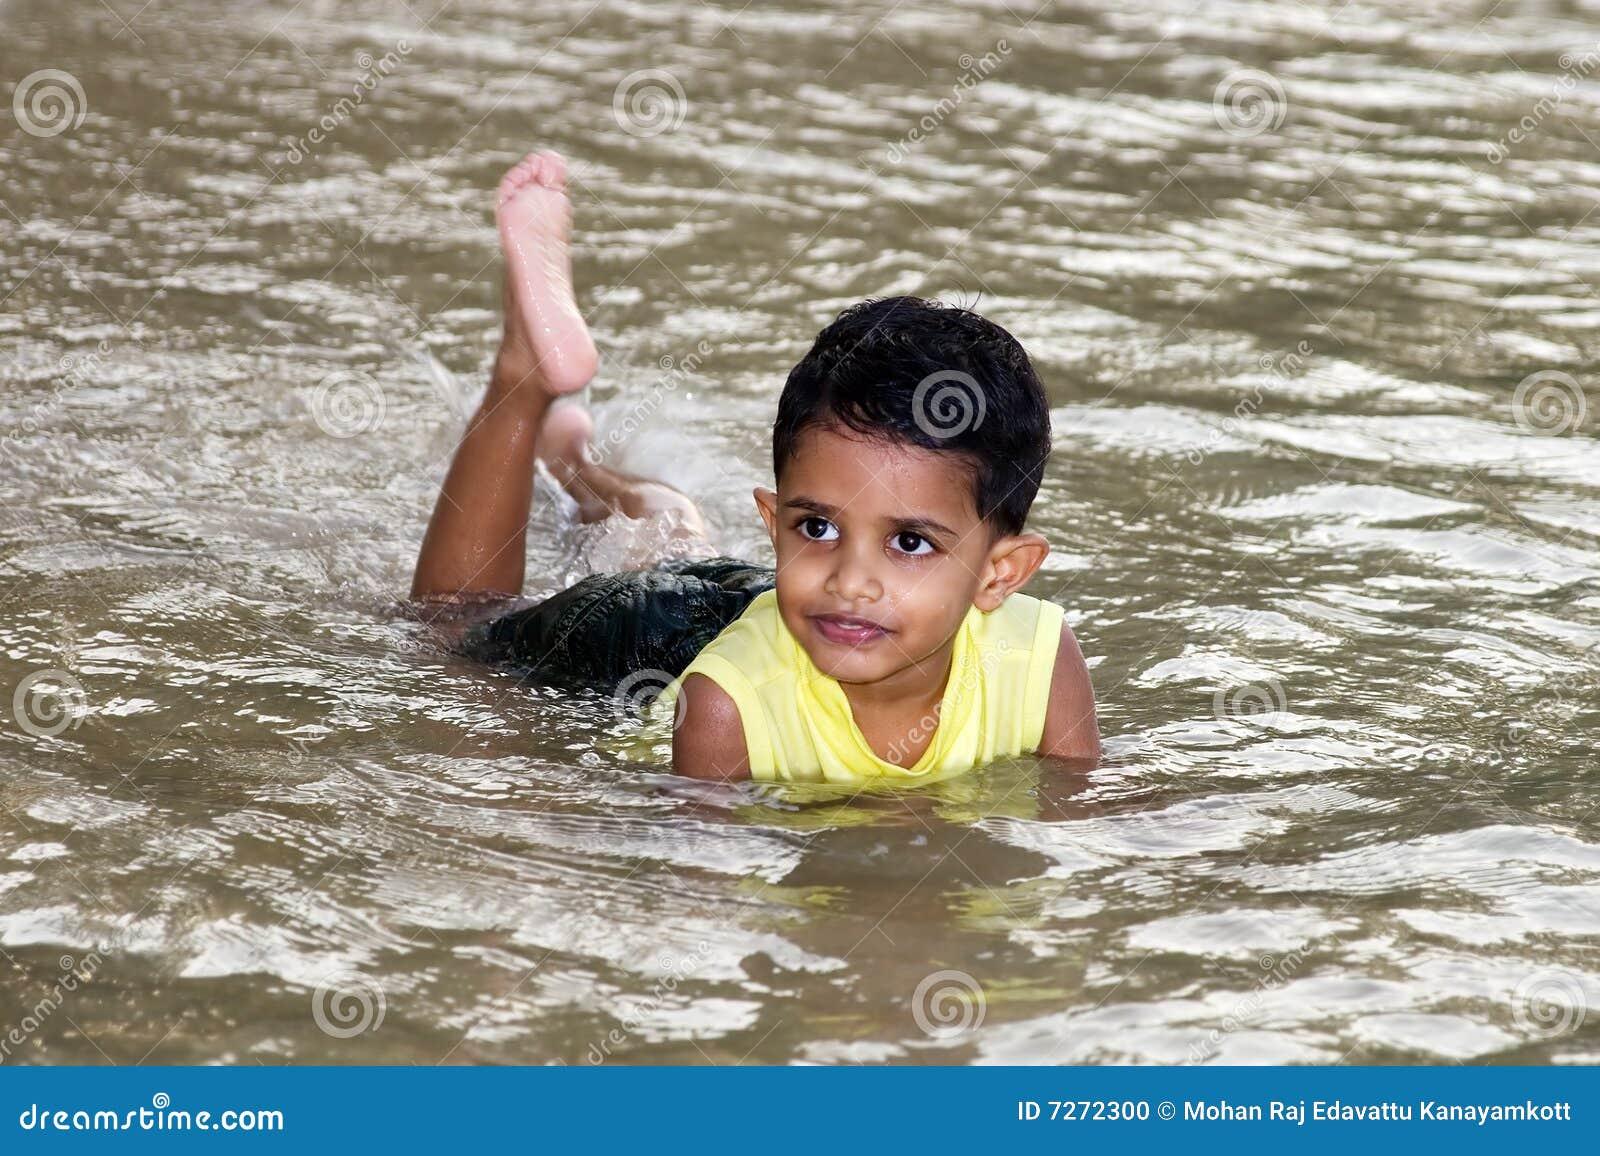 boy swimming river - photo #1